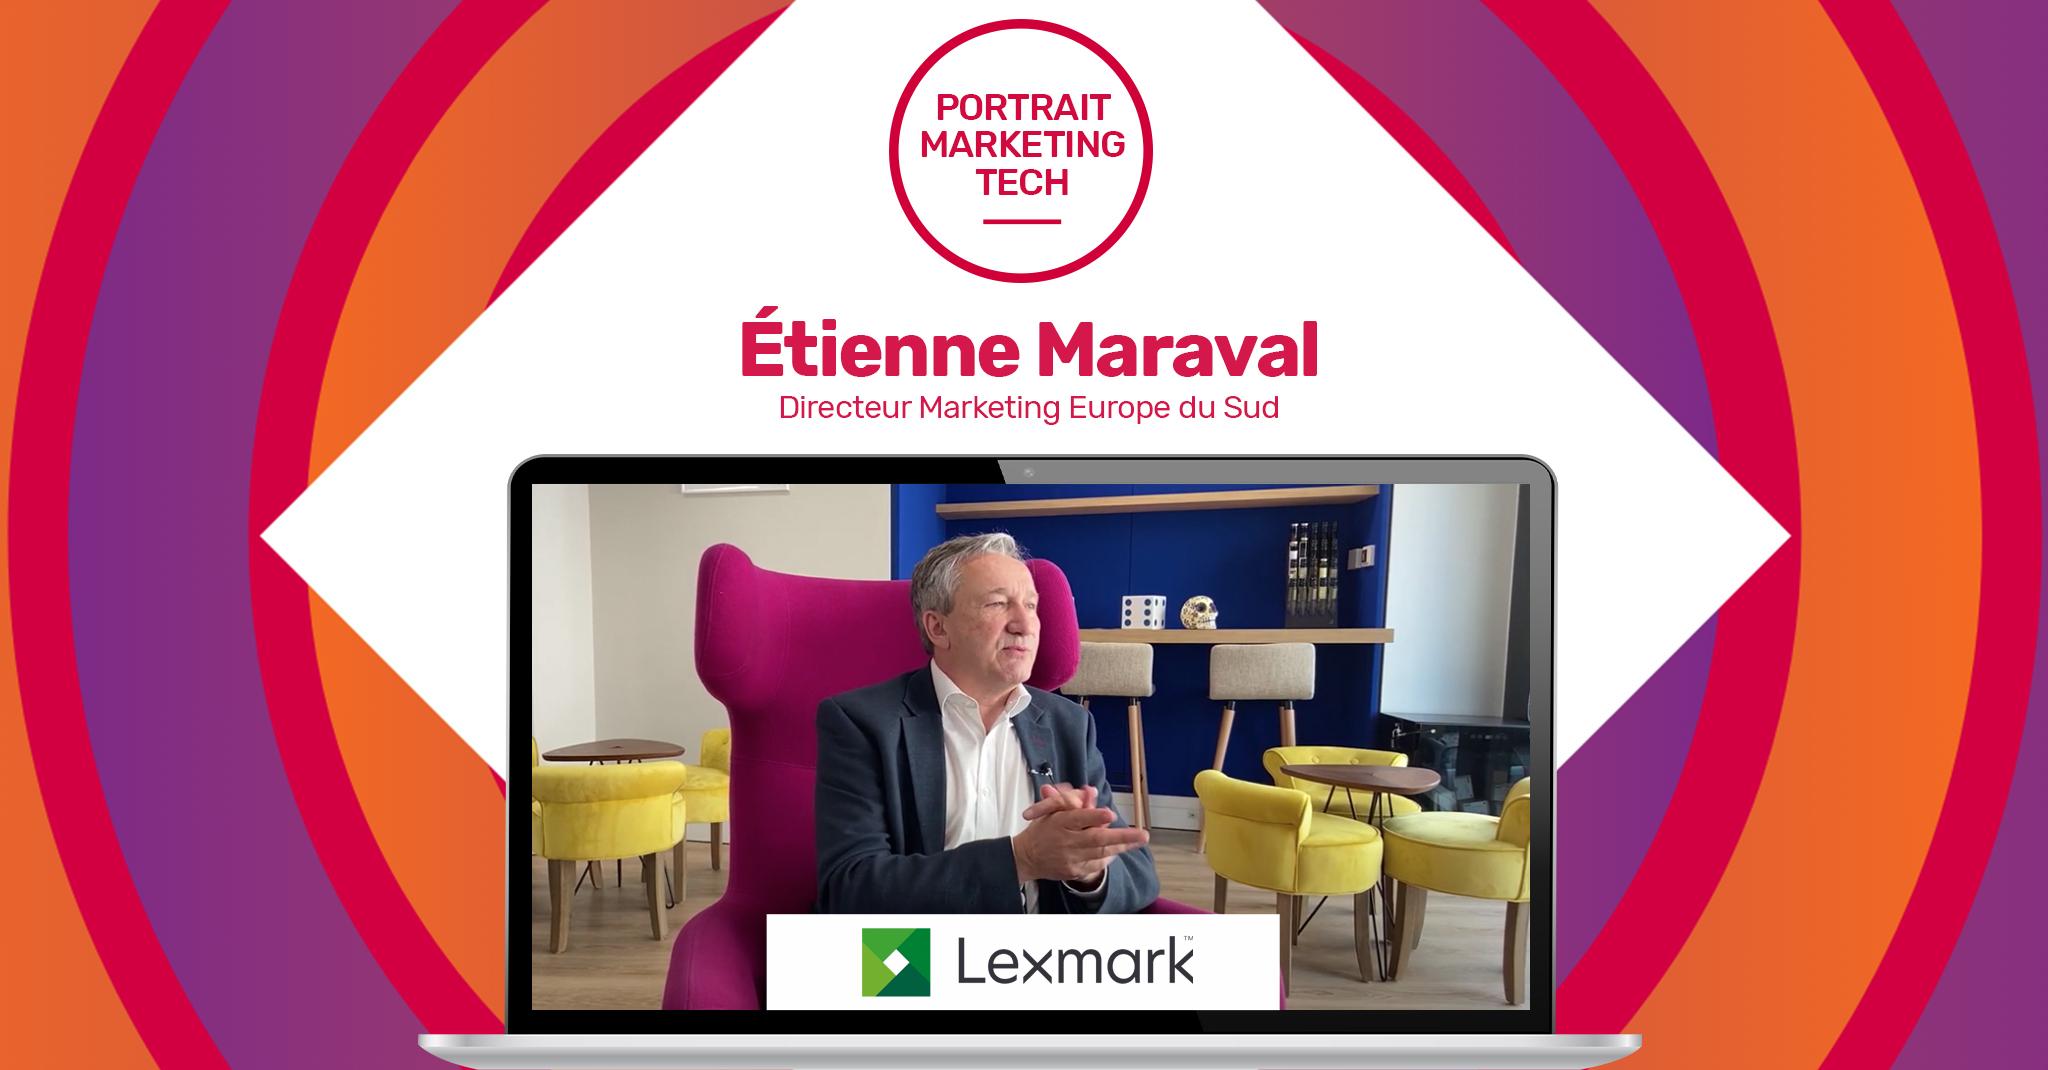 Portait Marketing Tech - Lexmark